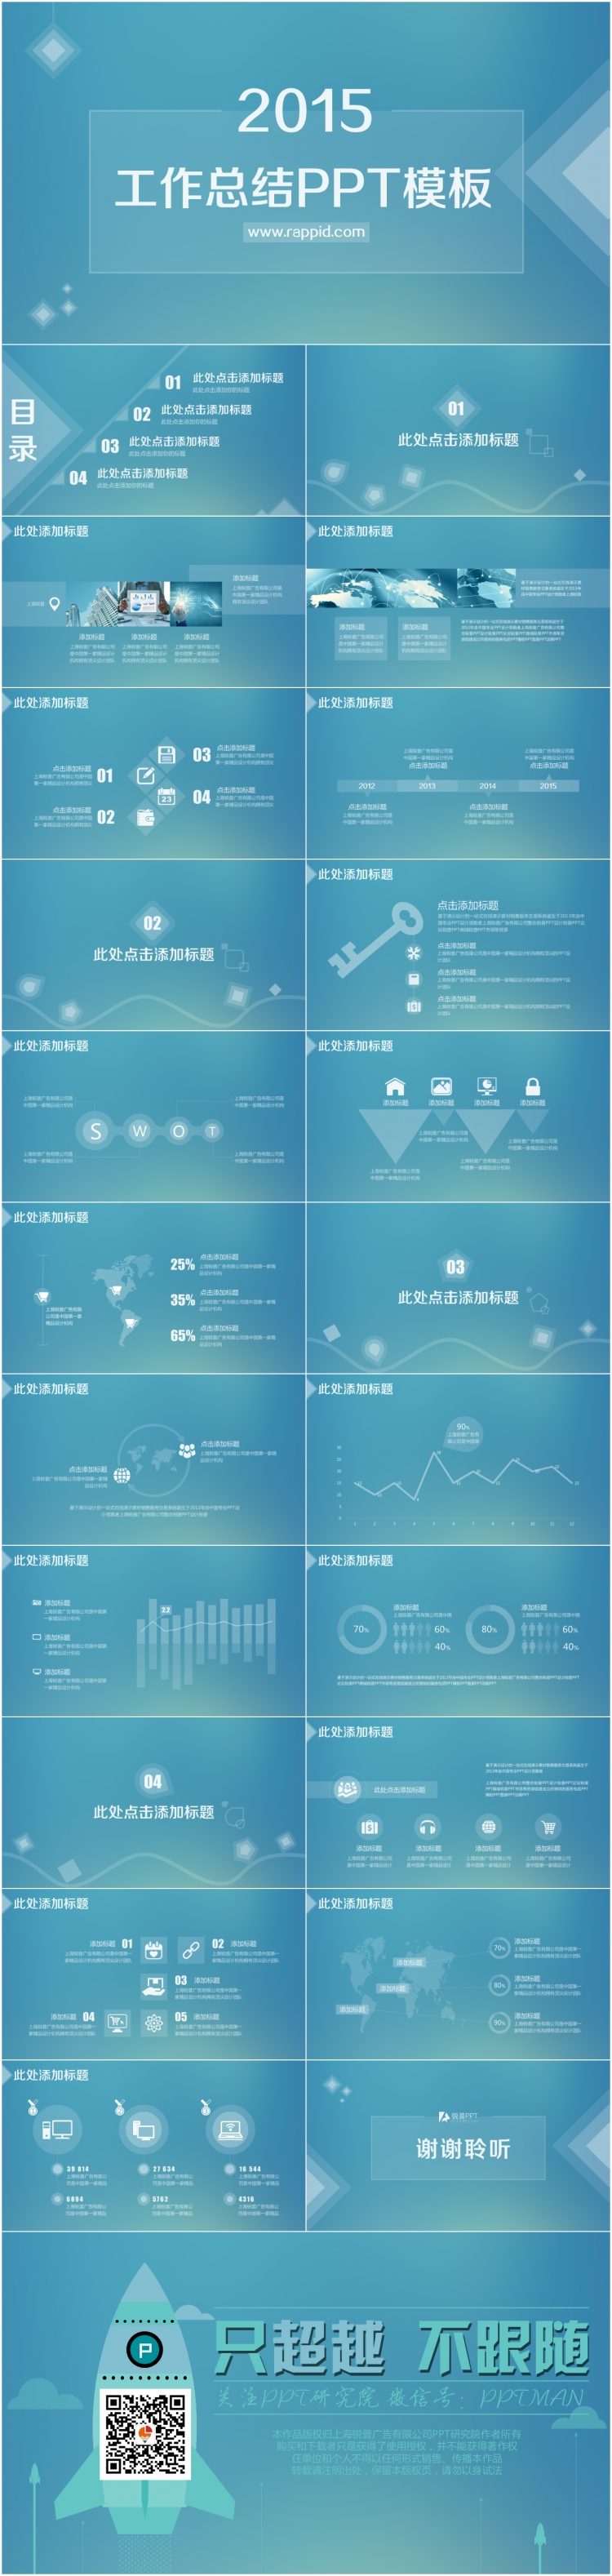 IOS质感风格商务汇报PPT模板